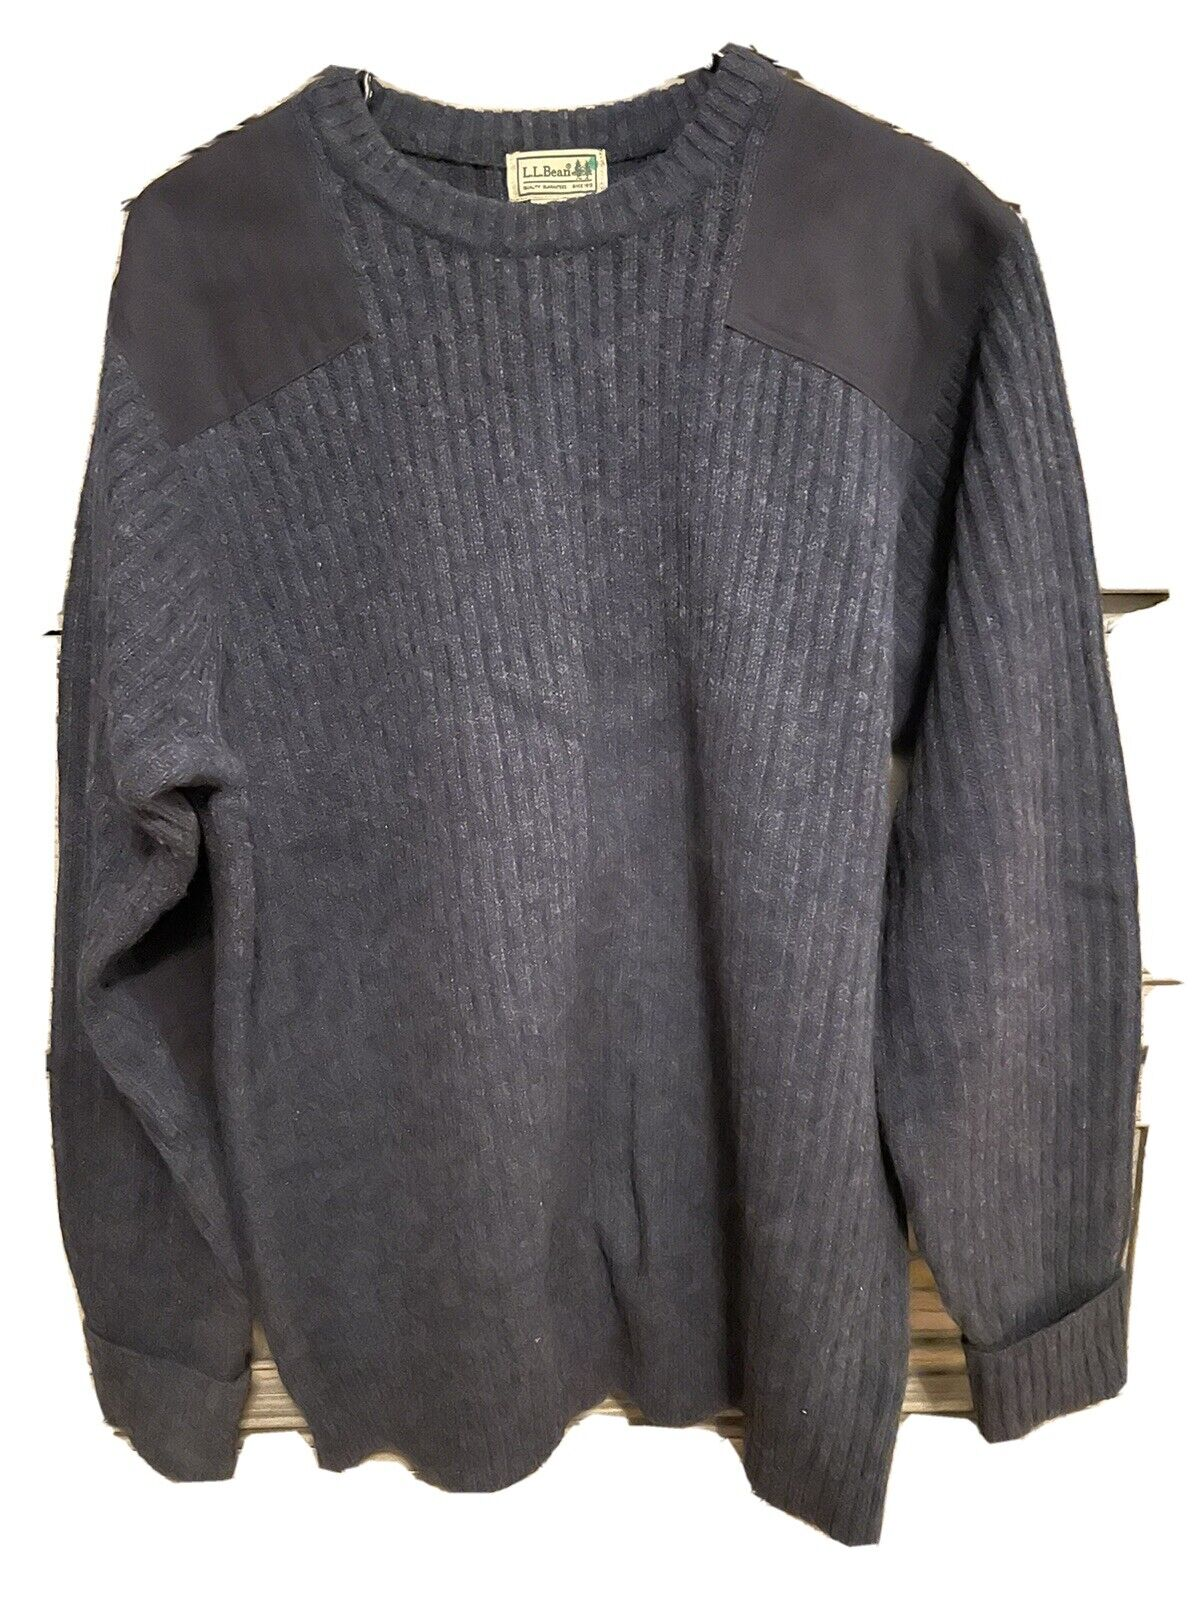 Mens LL Bean Sweater - image 1